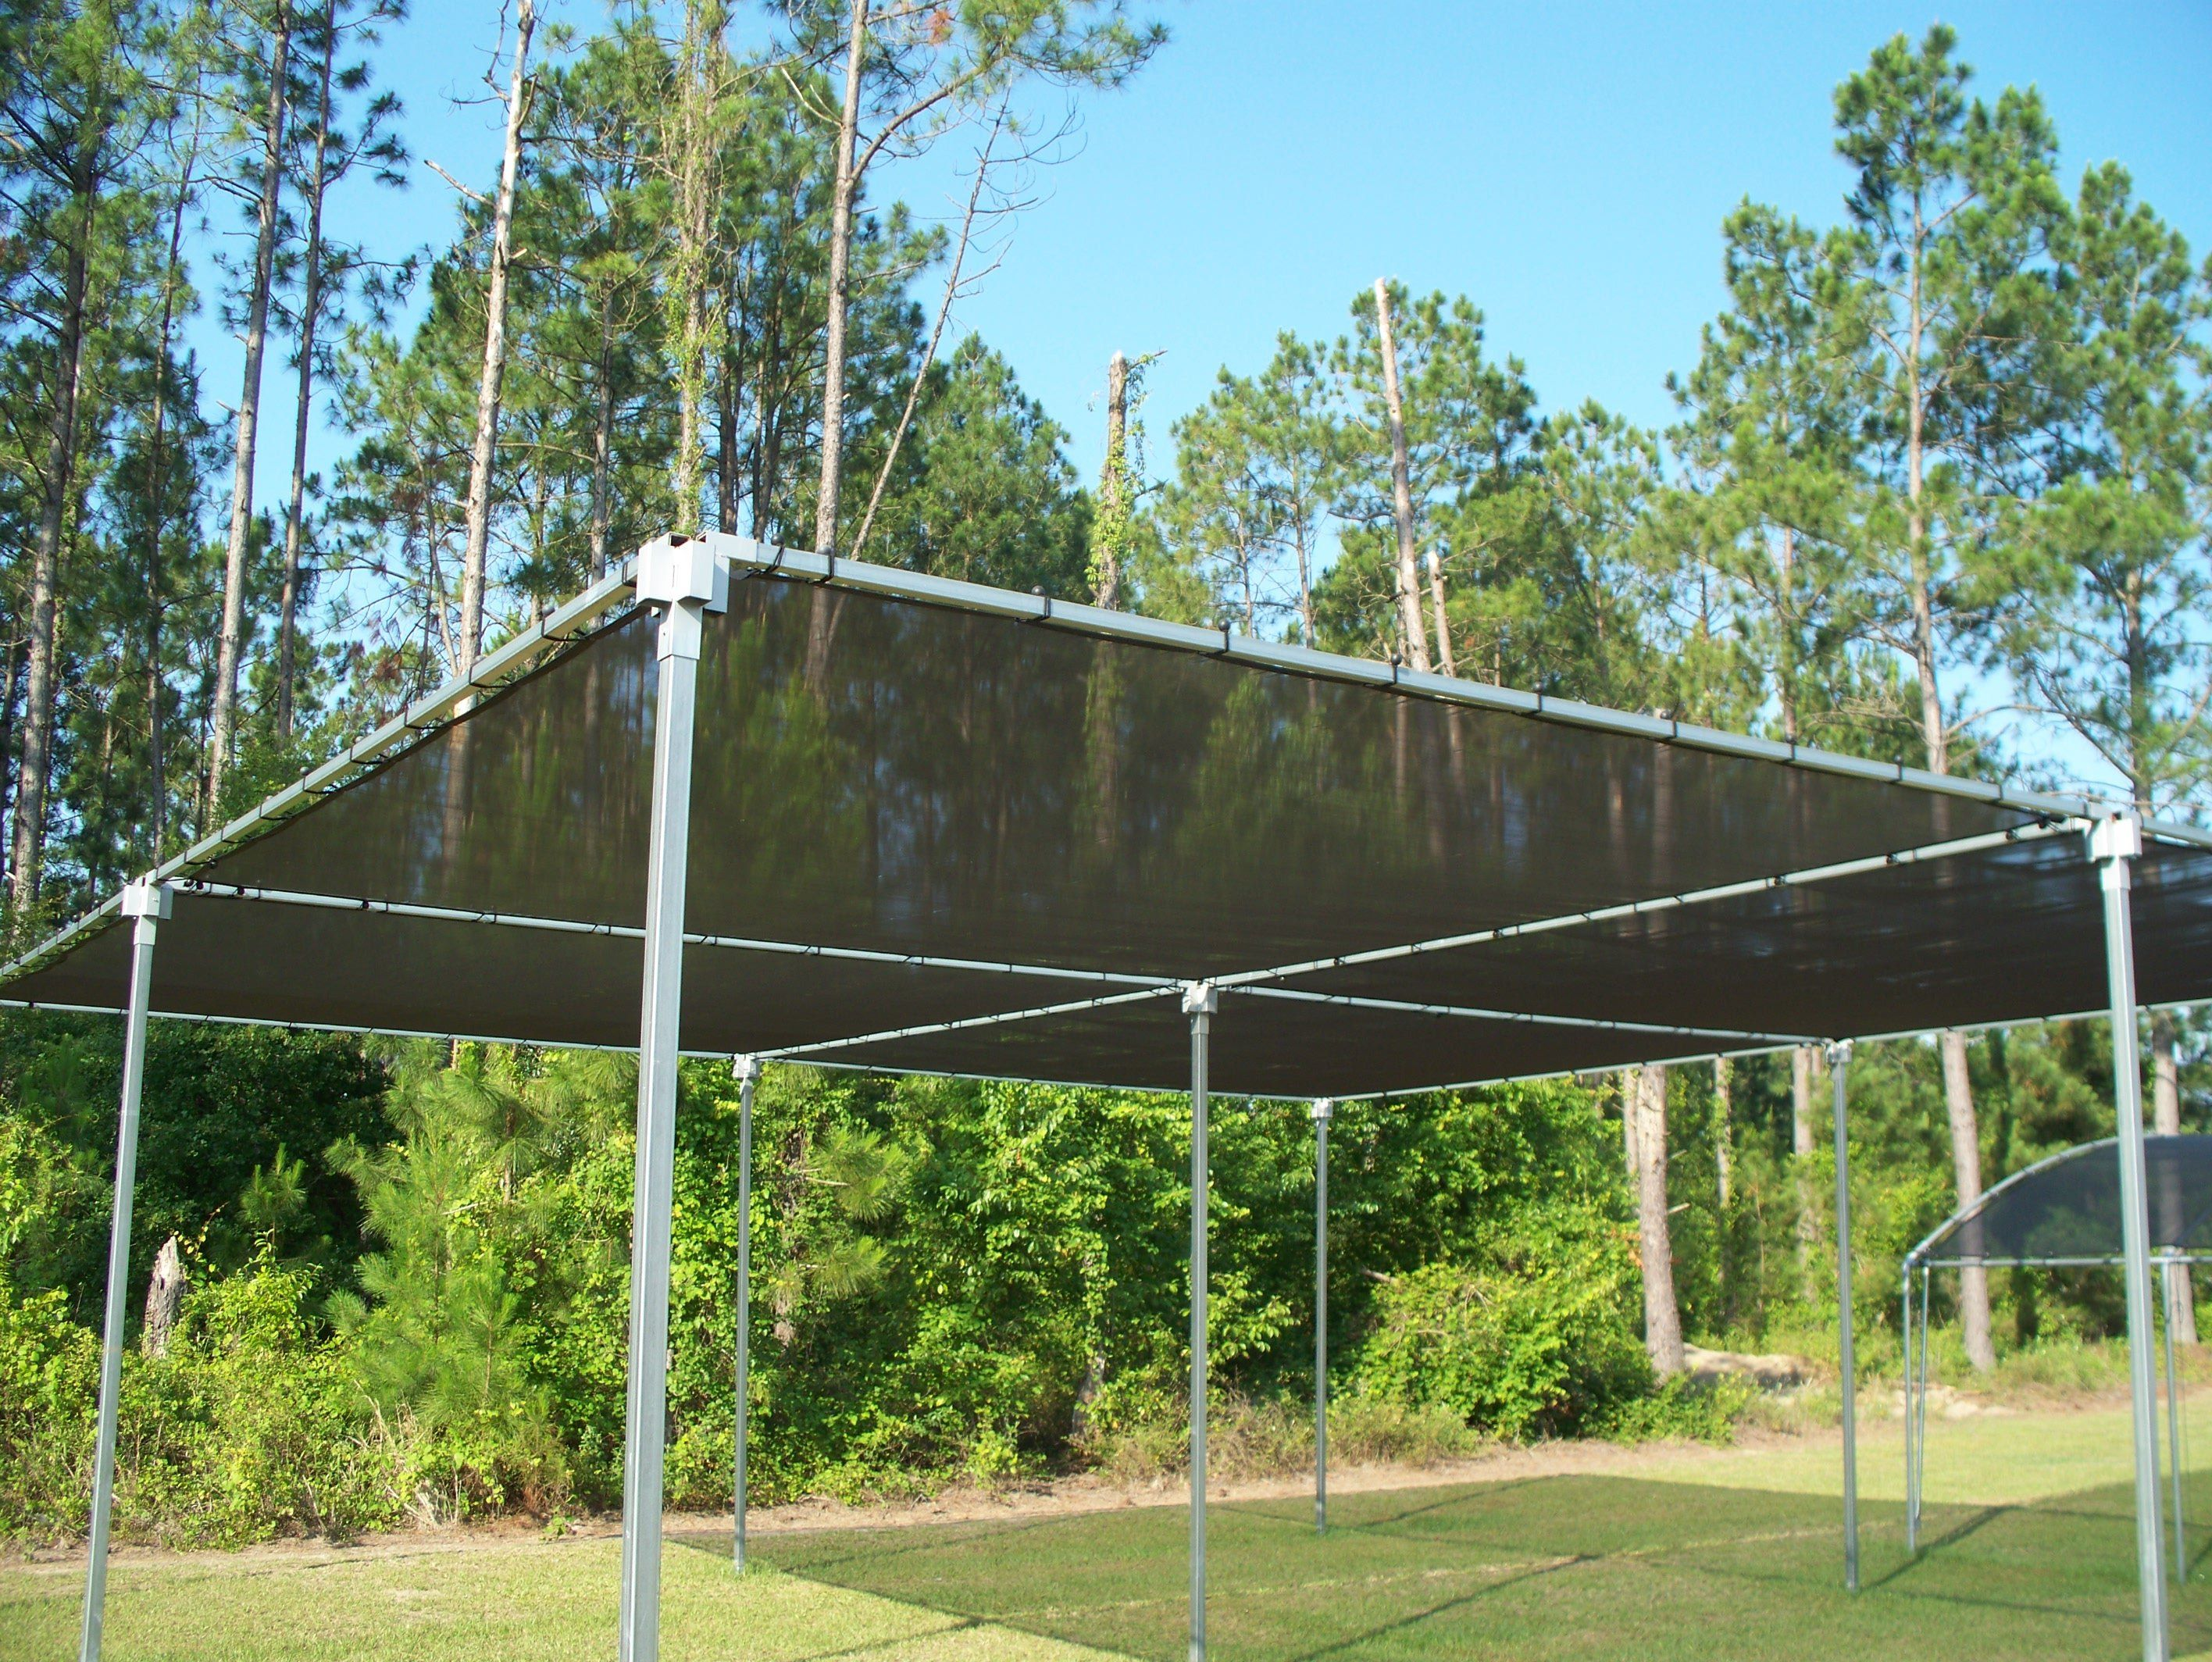 Flat Top Shade Atlas Greenhouse Shade Structure Outdoor Shade Diy Shades